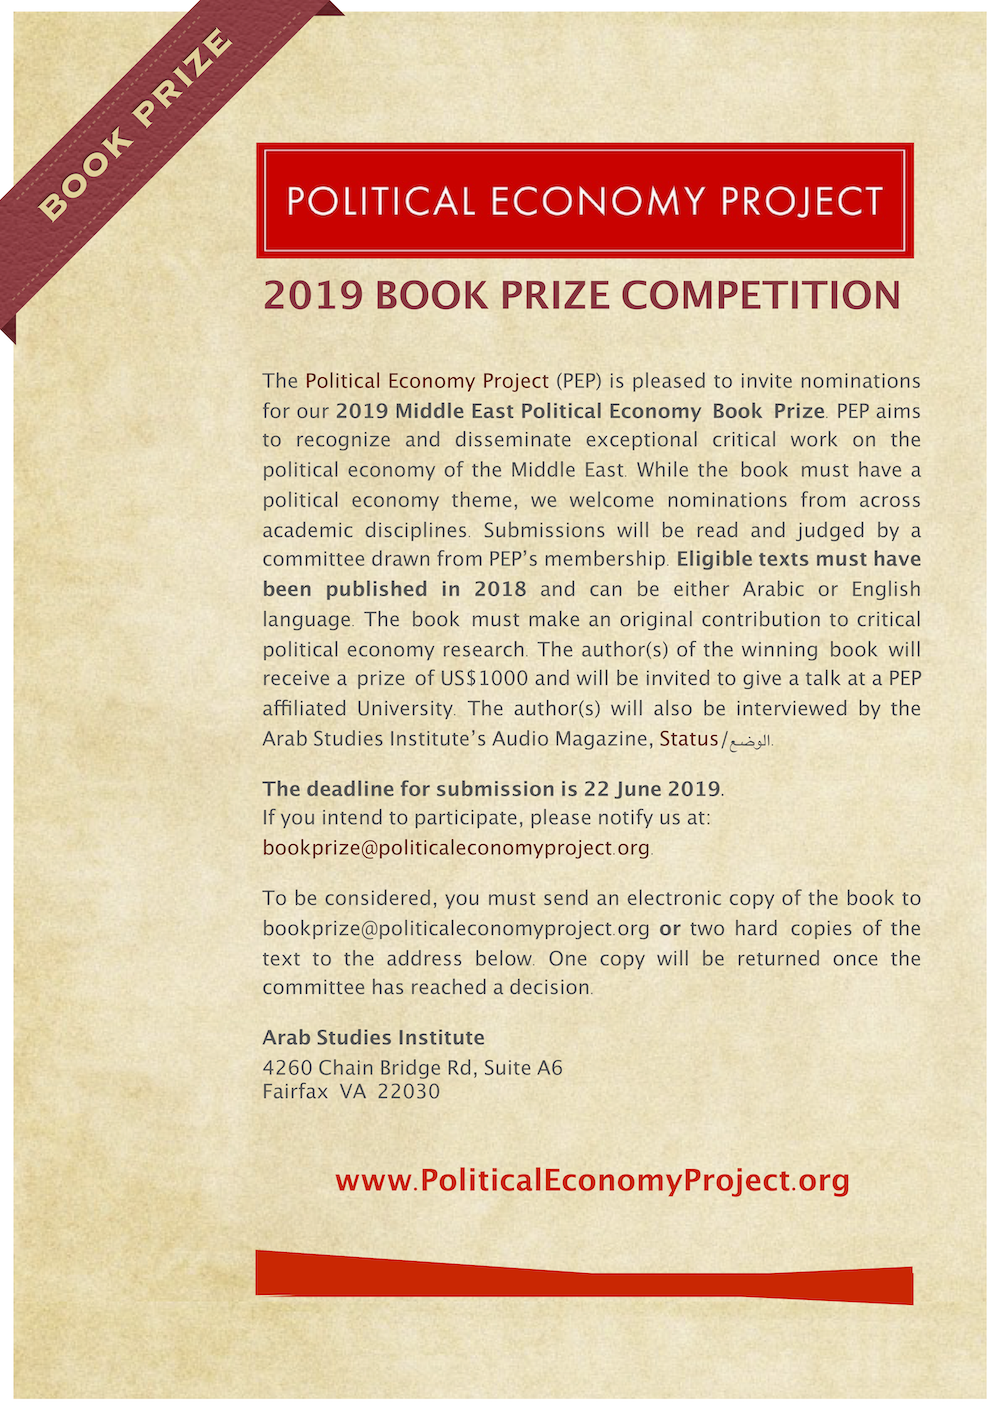 Jadaliyya - Announcing the 2019 Political Economy Book Prize